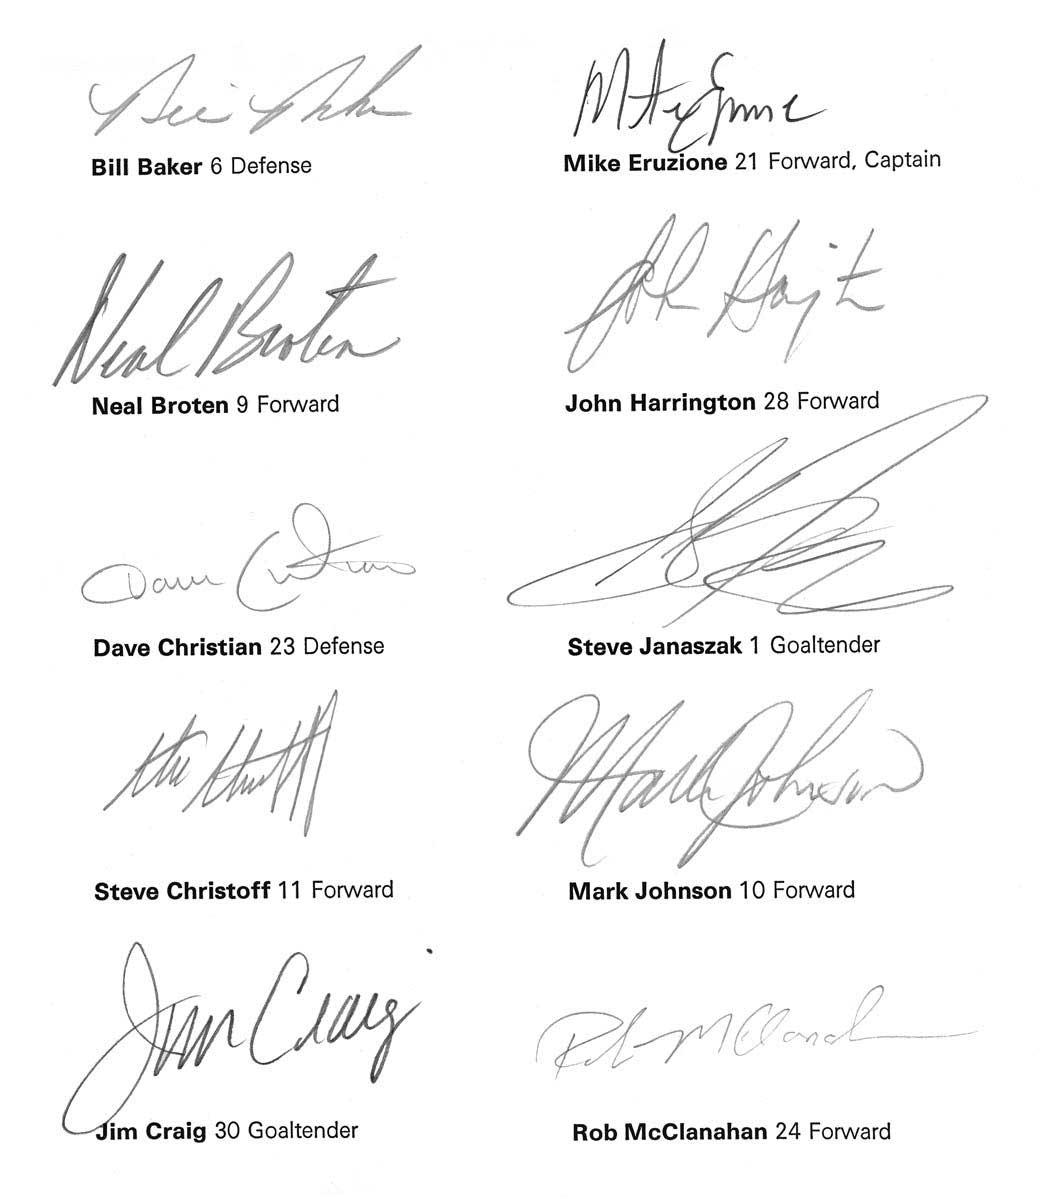 The 1980 U.S. Olympic Hockey Team signatures